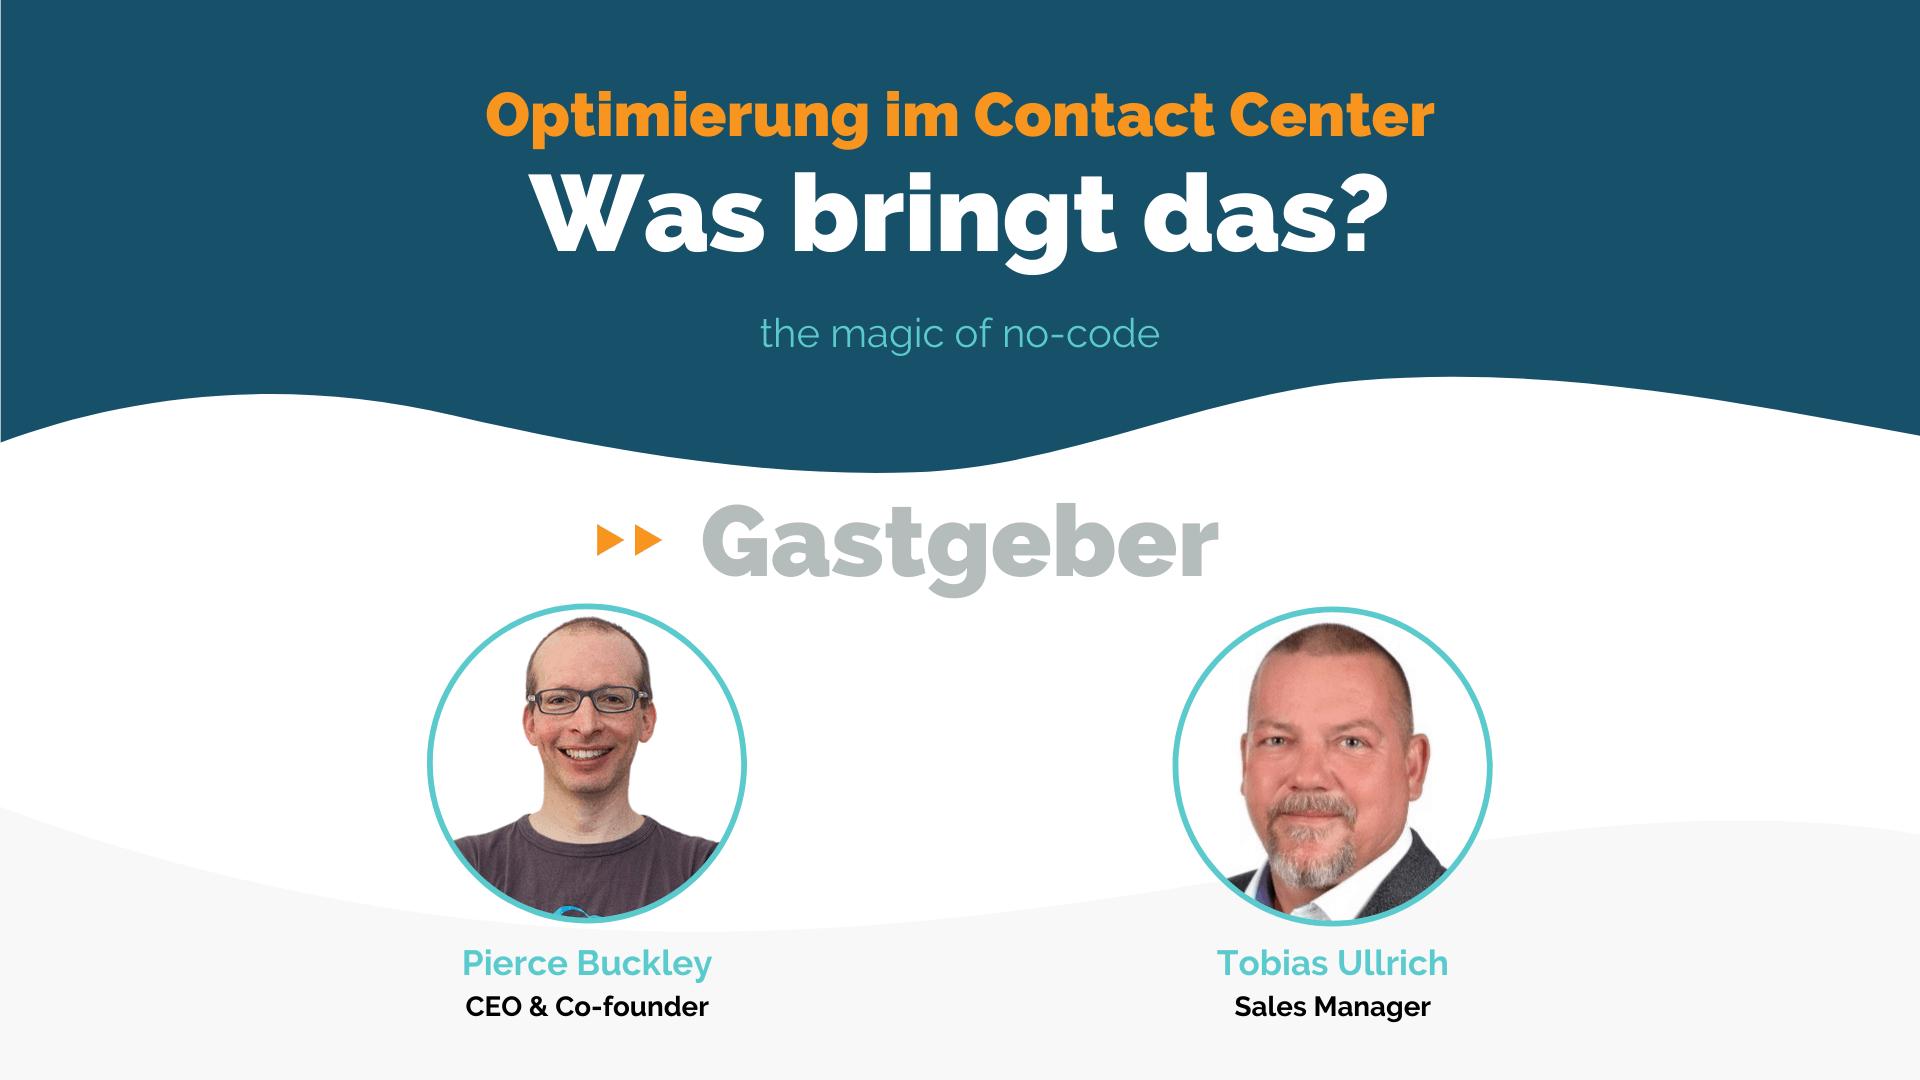 W7 DE - Optimierung im Contact Center - Was bringt das_